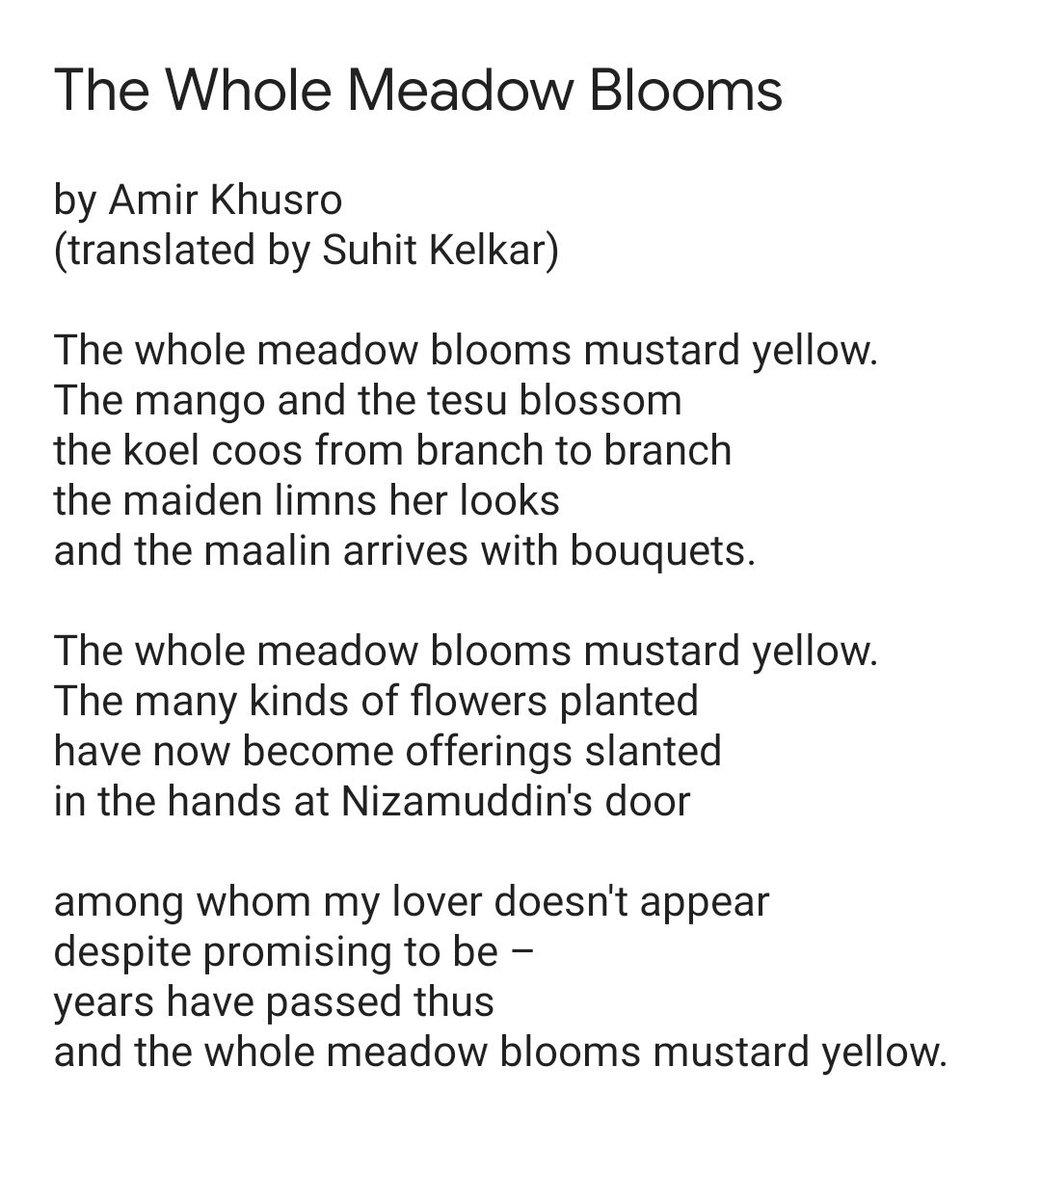 "Suhit Kelkar on Twitter: ""I've translated, into English, Aamir Khusro's  'Sakal Ban Phool Rahi Sarson'. Do take a look at the translation below!  #poetry #india #amir_khusro #translation lation… https://t.co/DI8OZdKFz7"""